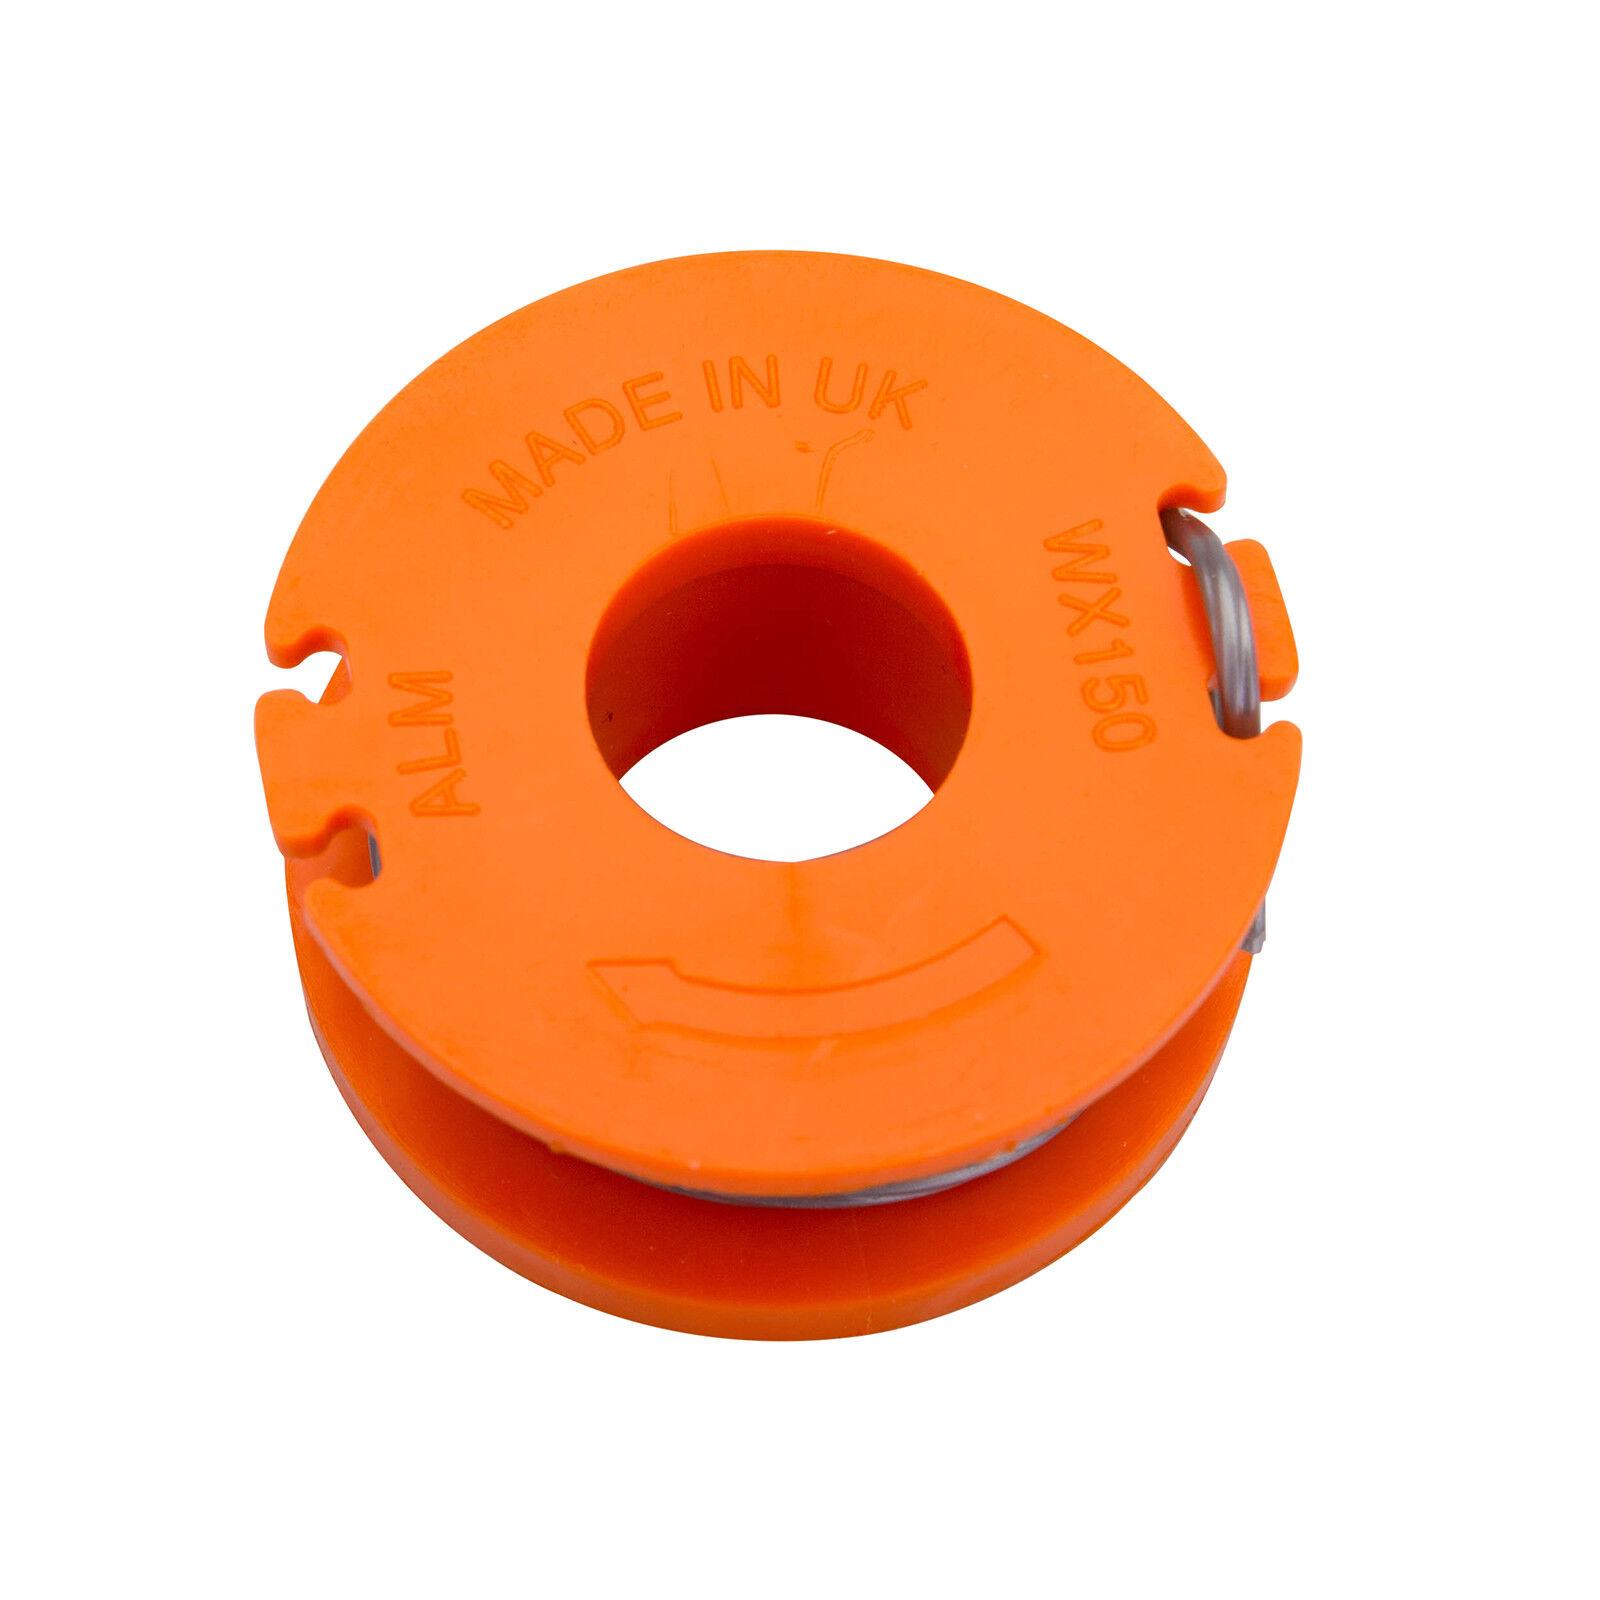 3 x Spool And Line Fits Qualcast CGT18LA 105328 18V Cordless Strimmer CGT25